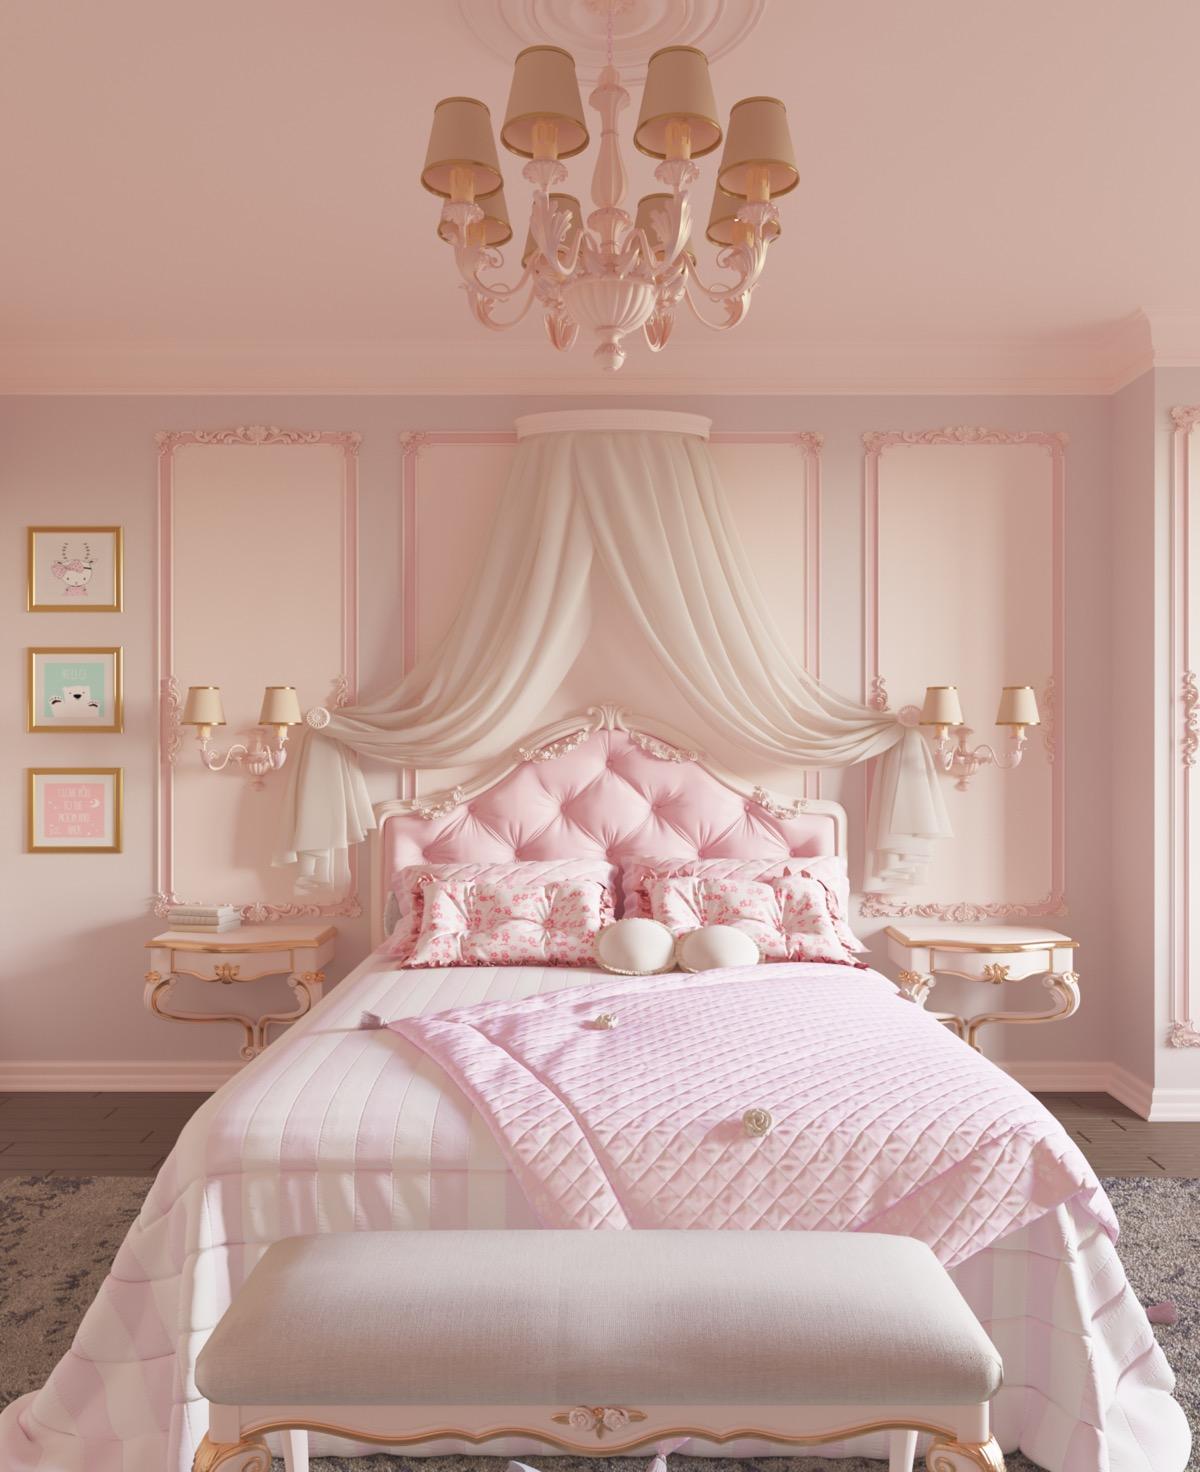 Blush Pink Color